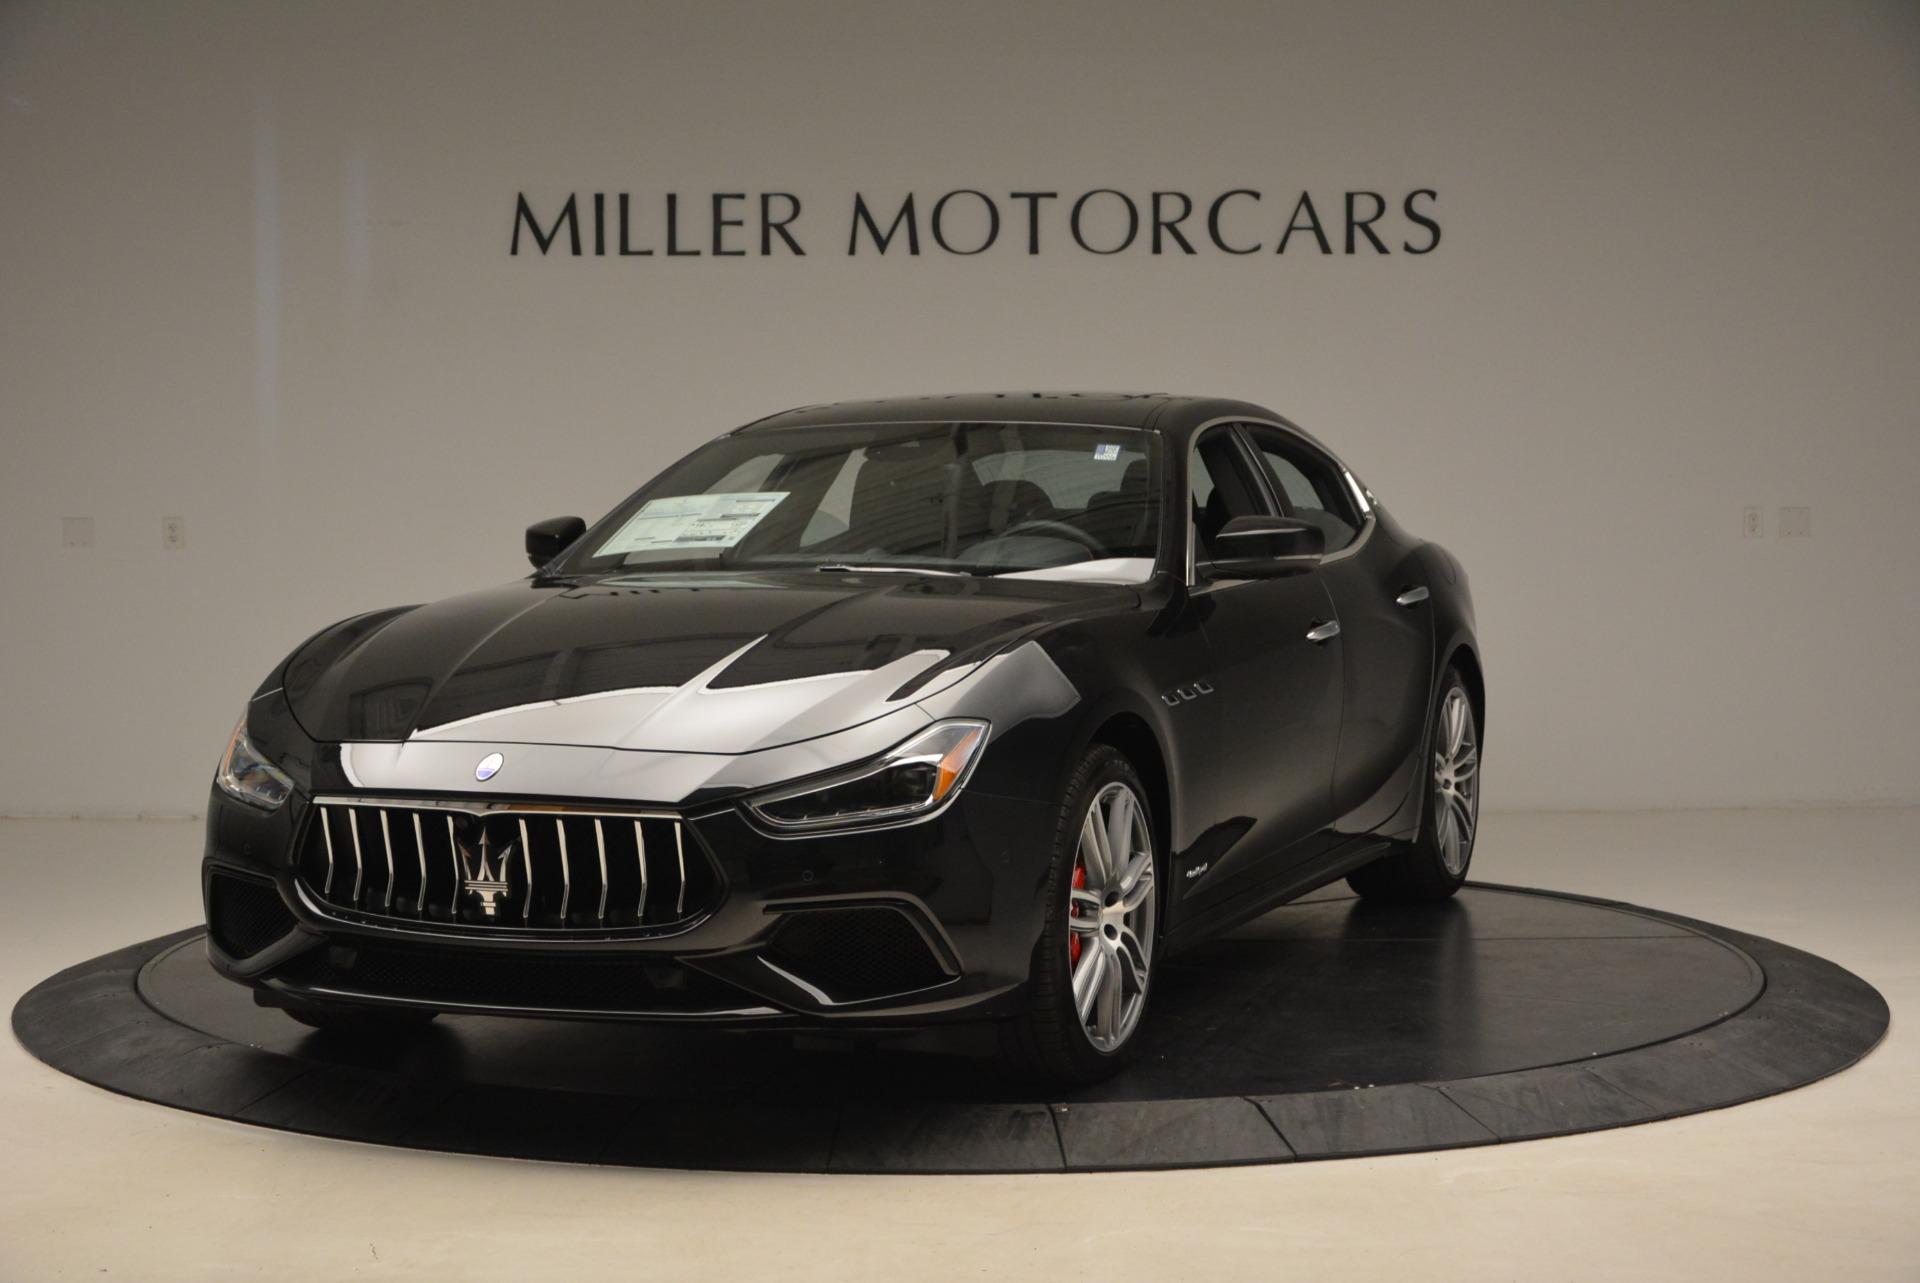 New 2018 Maserati Ghibli S Q4 Gransport For Sale In Greenwich, CT 2036_main